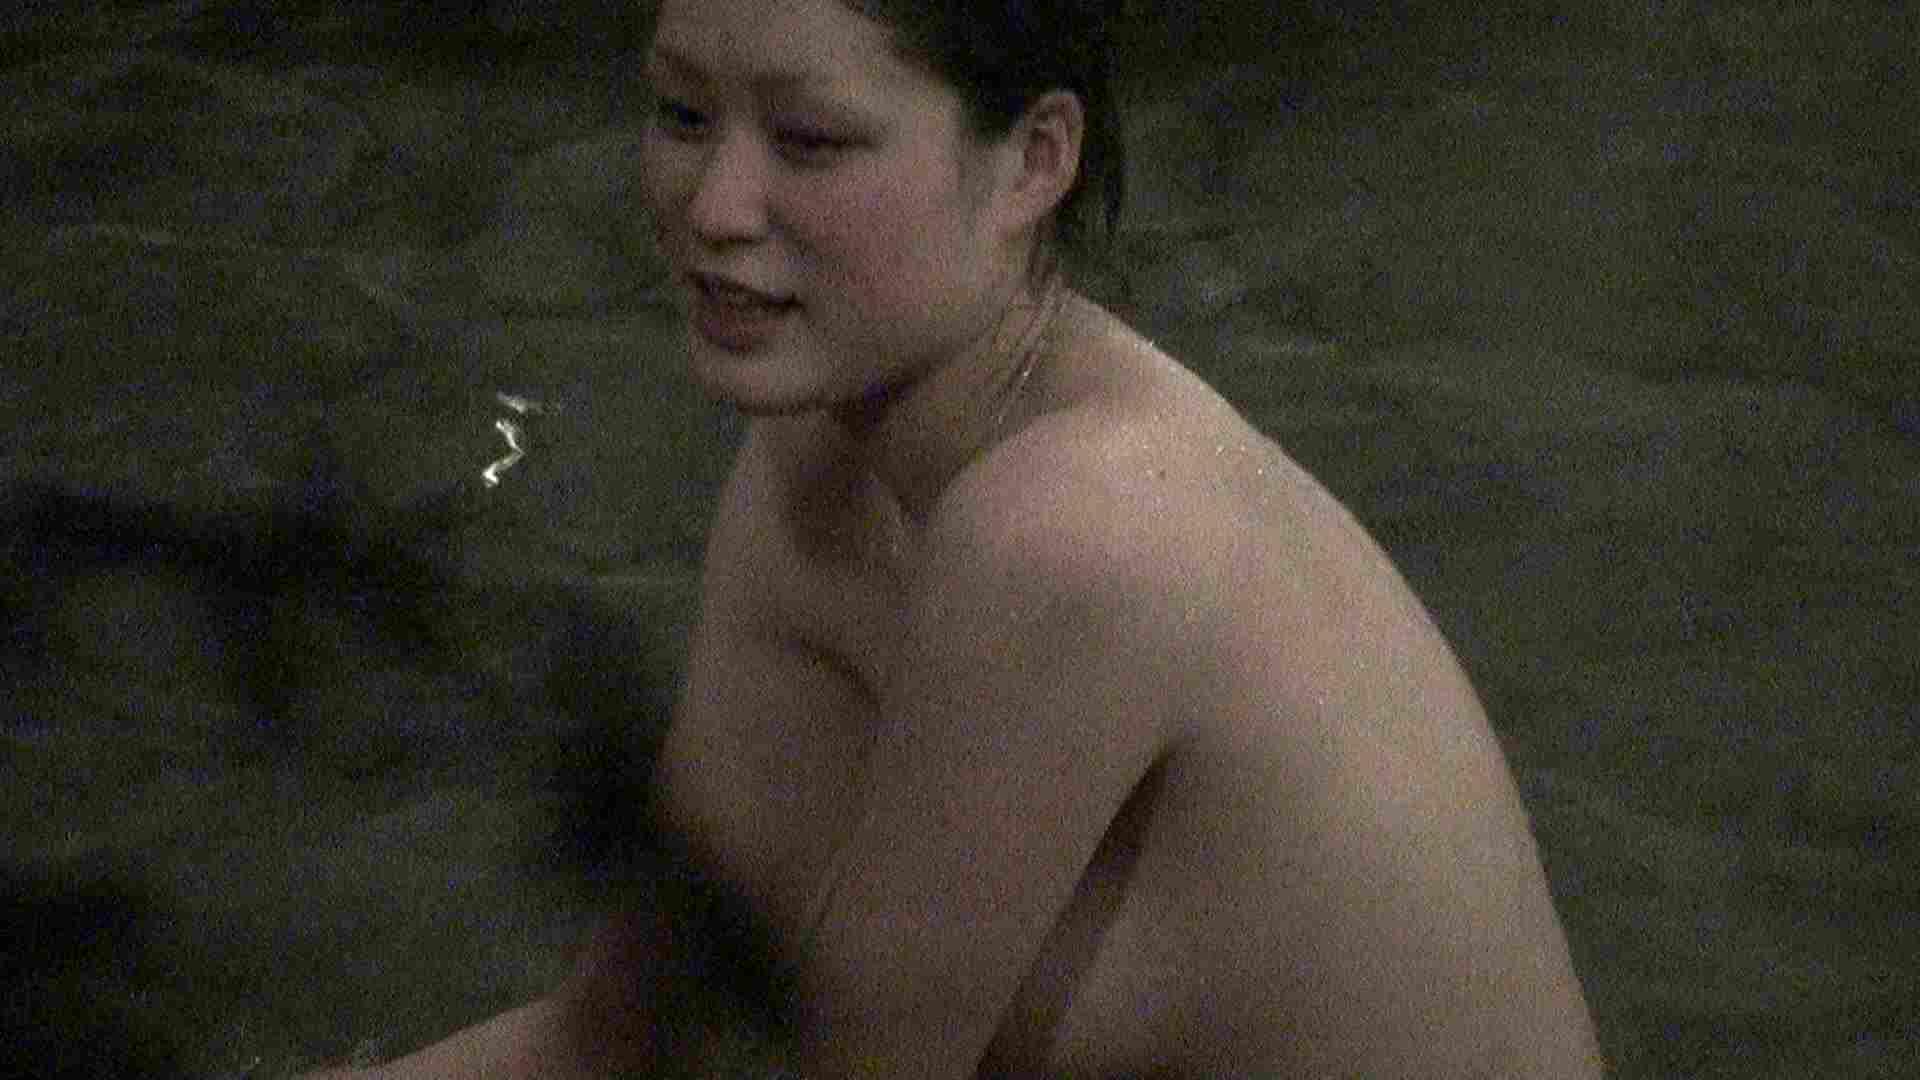 Aquaな露天風呂Vol.365 OL女体  72連発 63